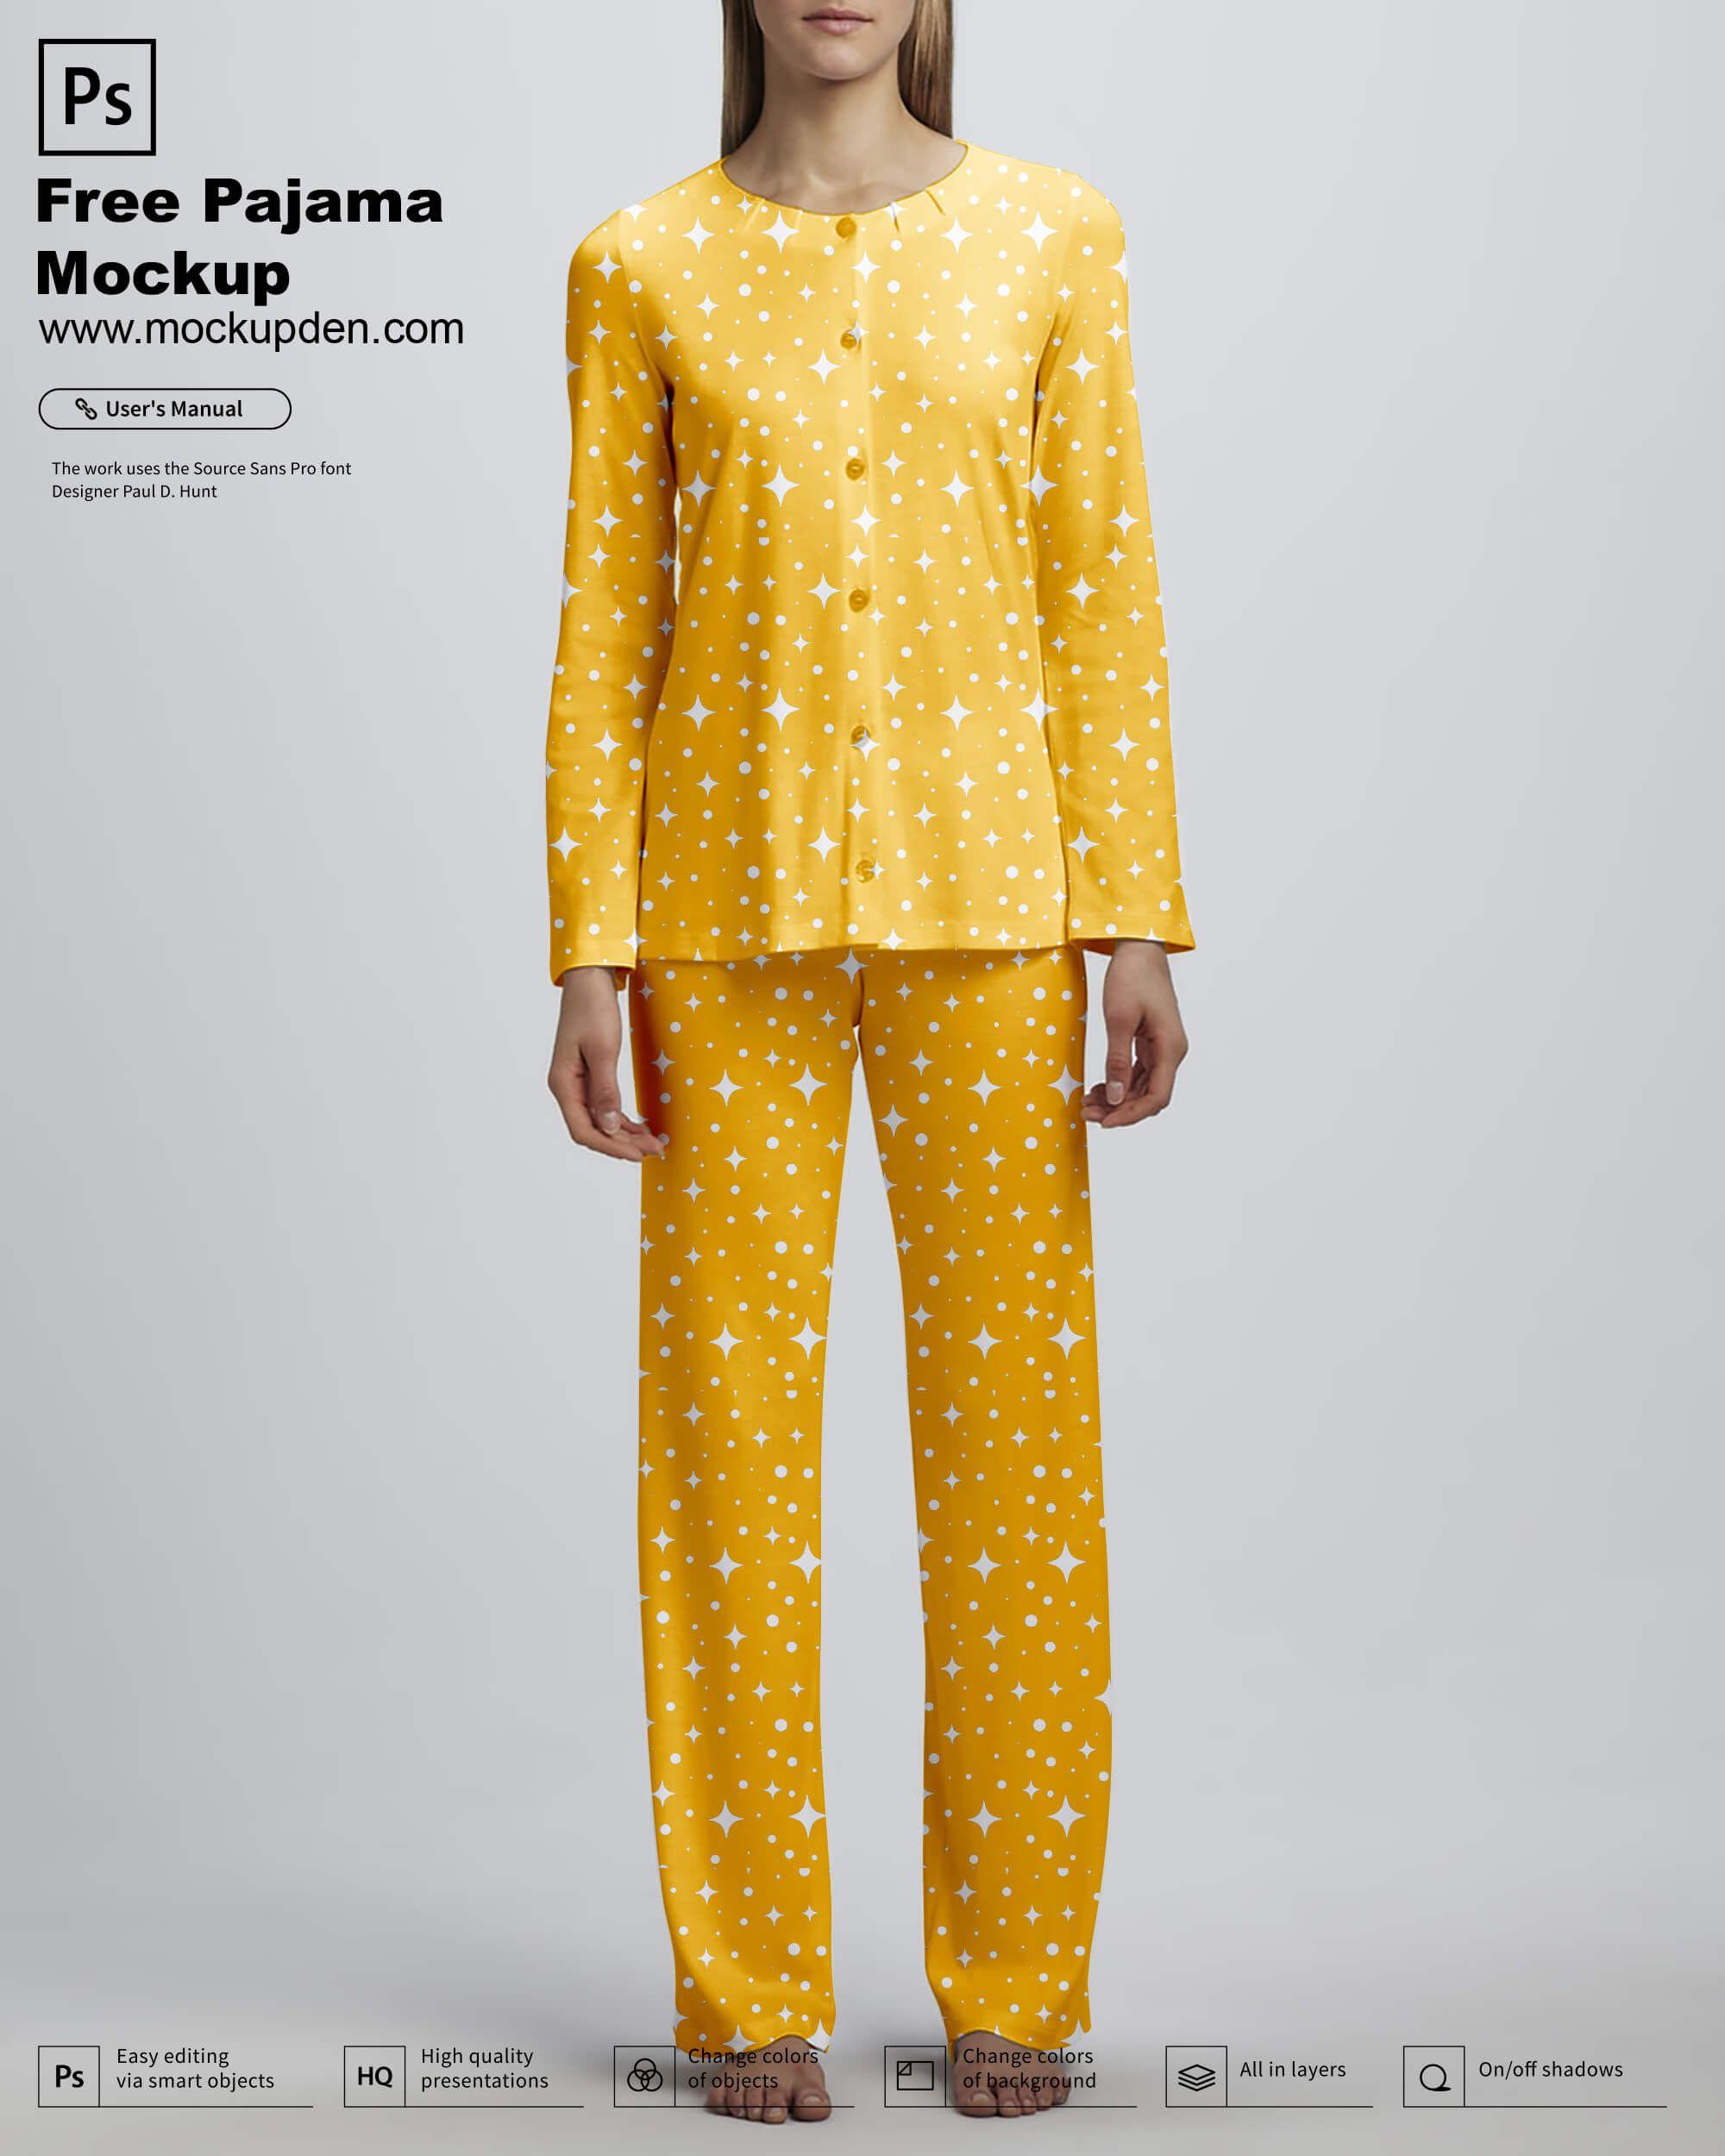 Download Free Pajamas Mockup Psd Template Clothing Mockup Mockup Psd Psd Template Free